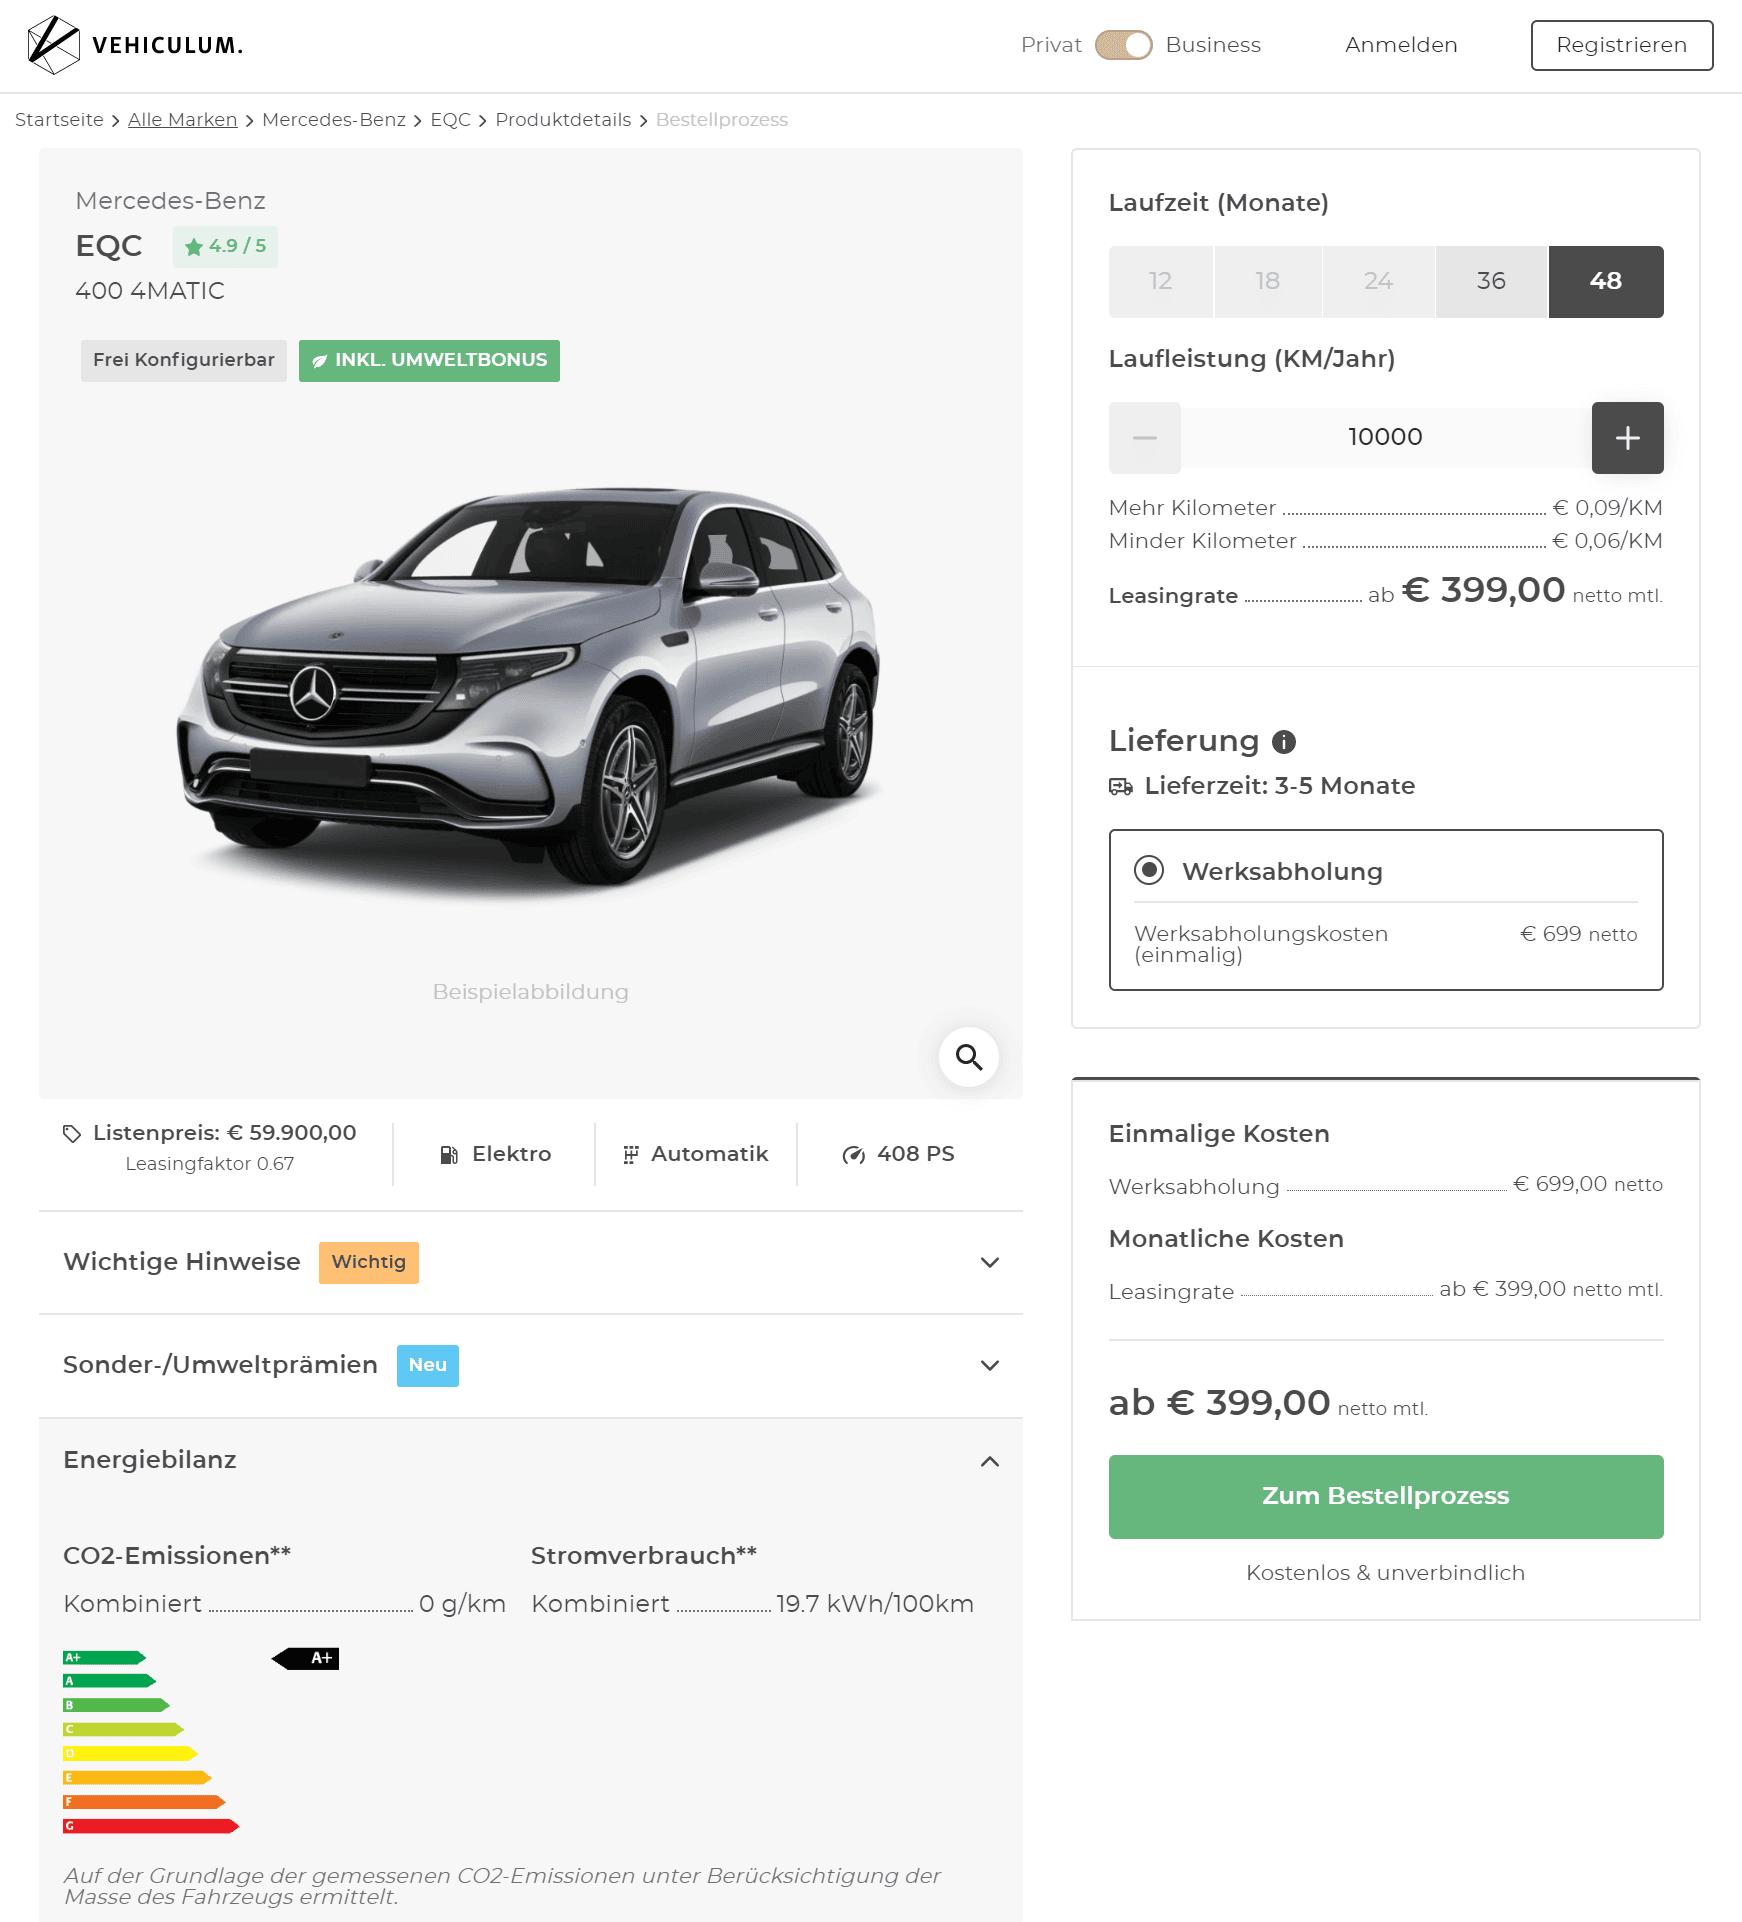 Mercedes-Benz EQC 400 4Matic Leasing Für 399 (503) Euro Im